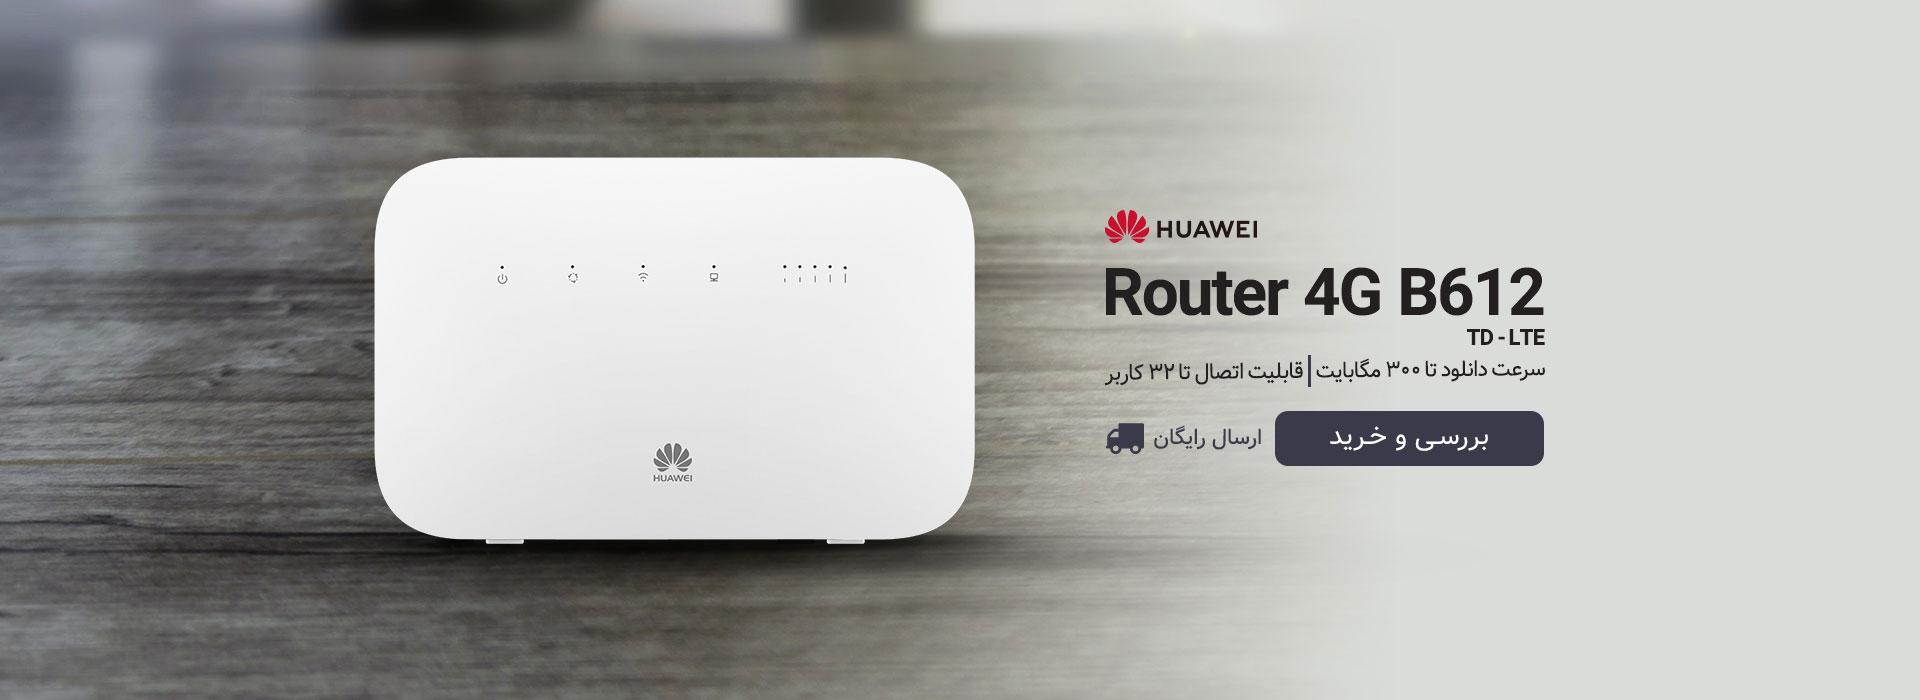 مودم روتر HUAWEI 4.5G/TD-LTE مدل Router 2 Pro B612